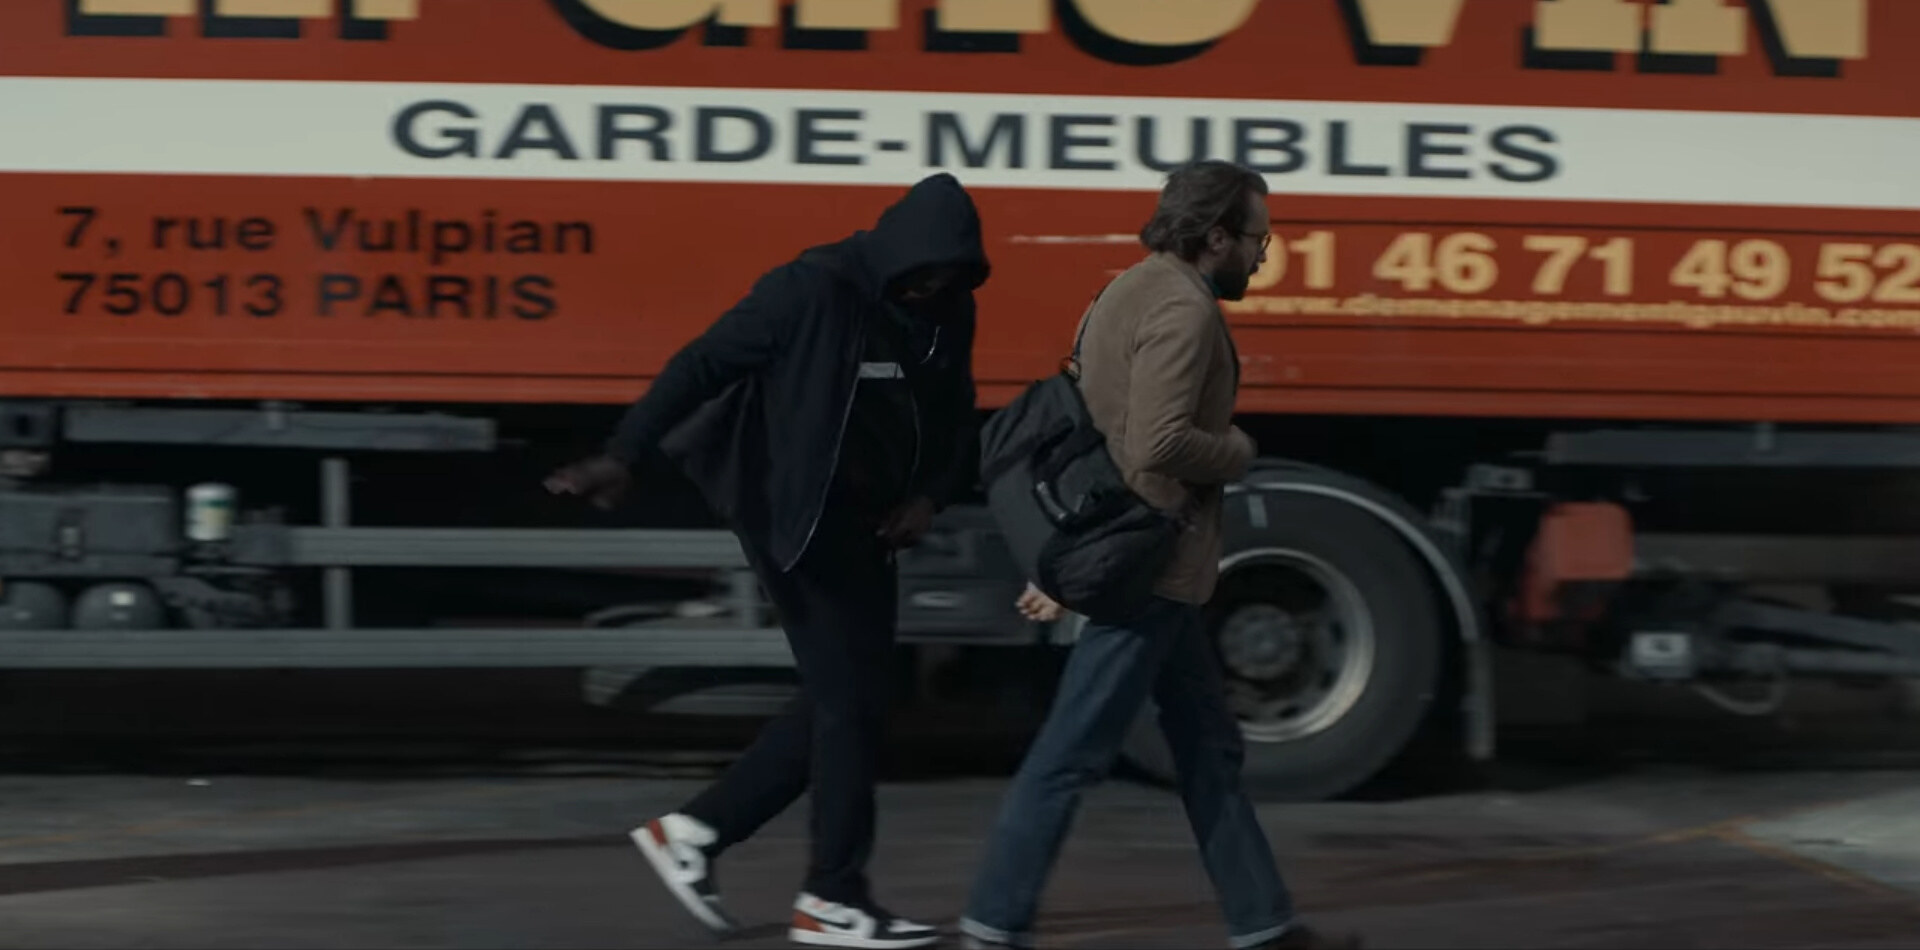 Lupin Netflix Parte 2 Air Jordan 1 Mid Union Black Toe